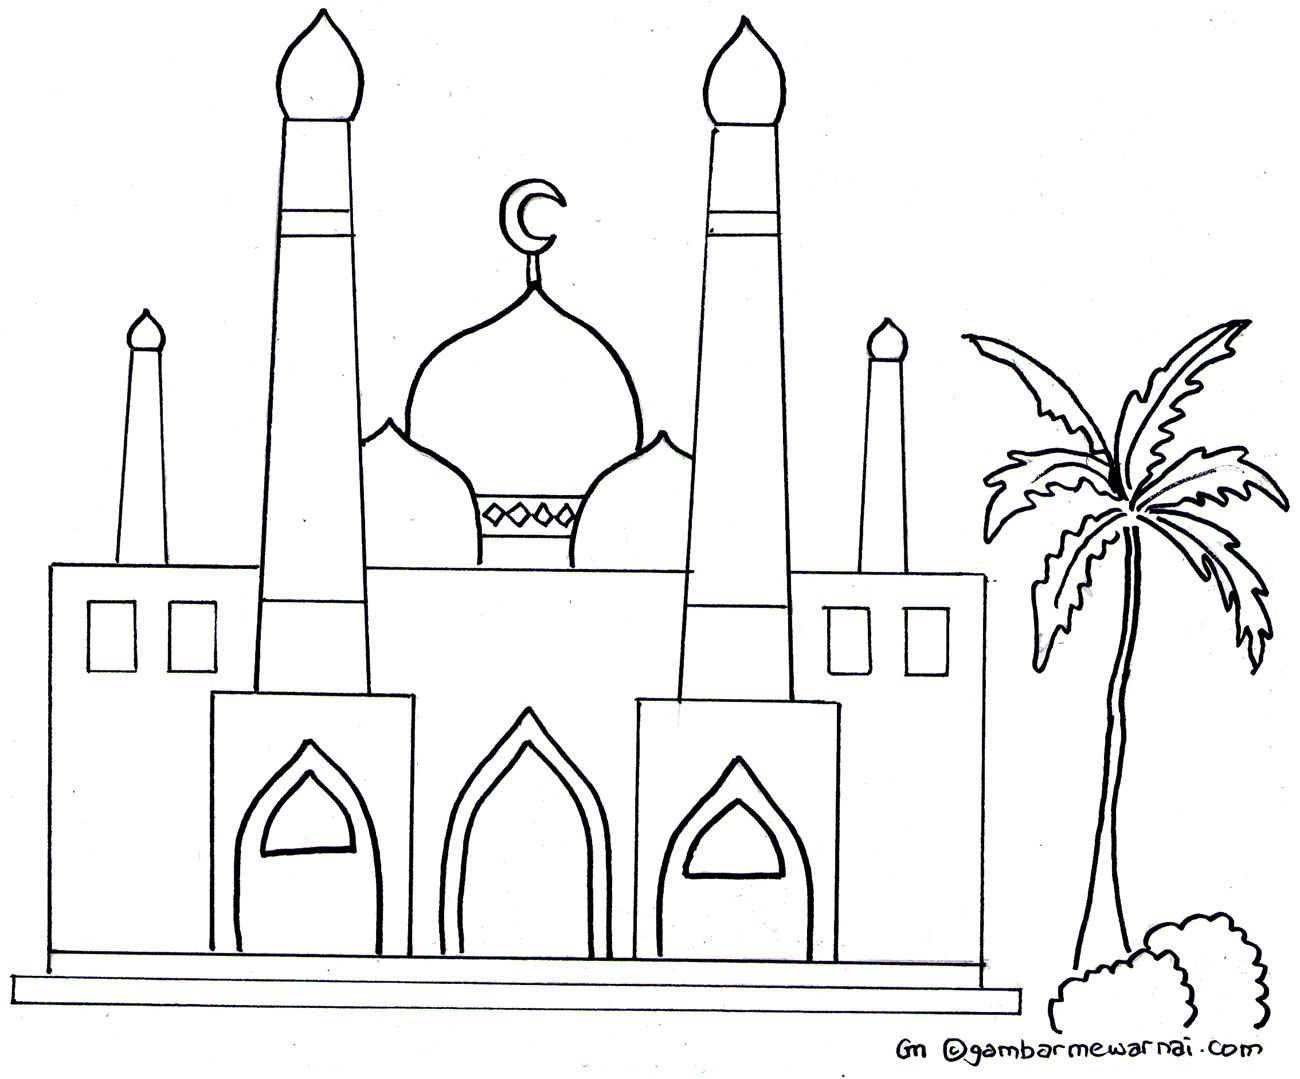 Gambar Mewarnai Masjid Gambar Mewarnai Buku mewarnai